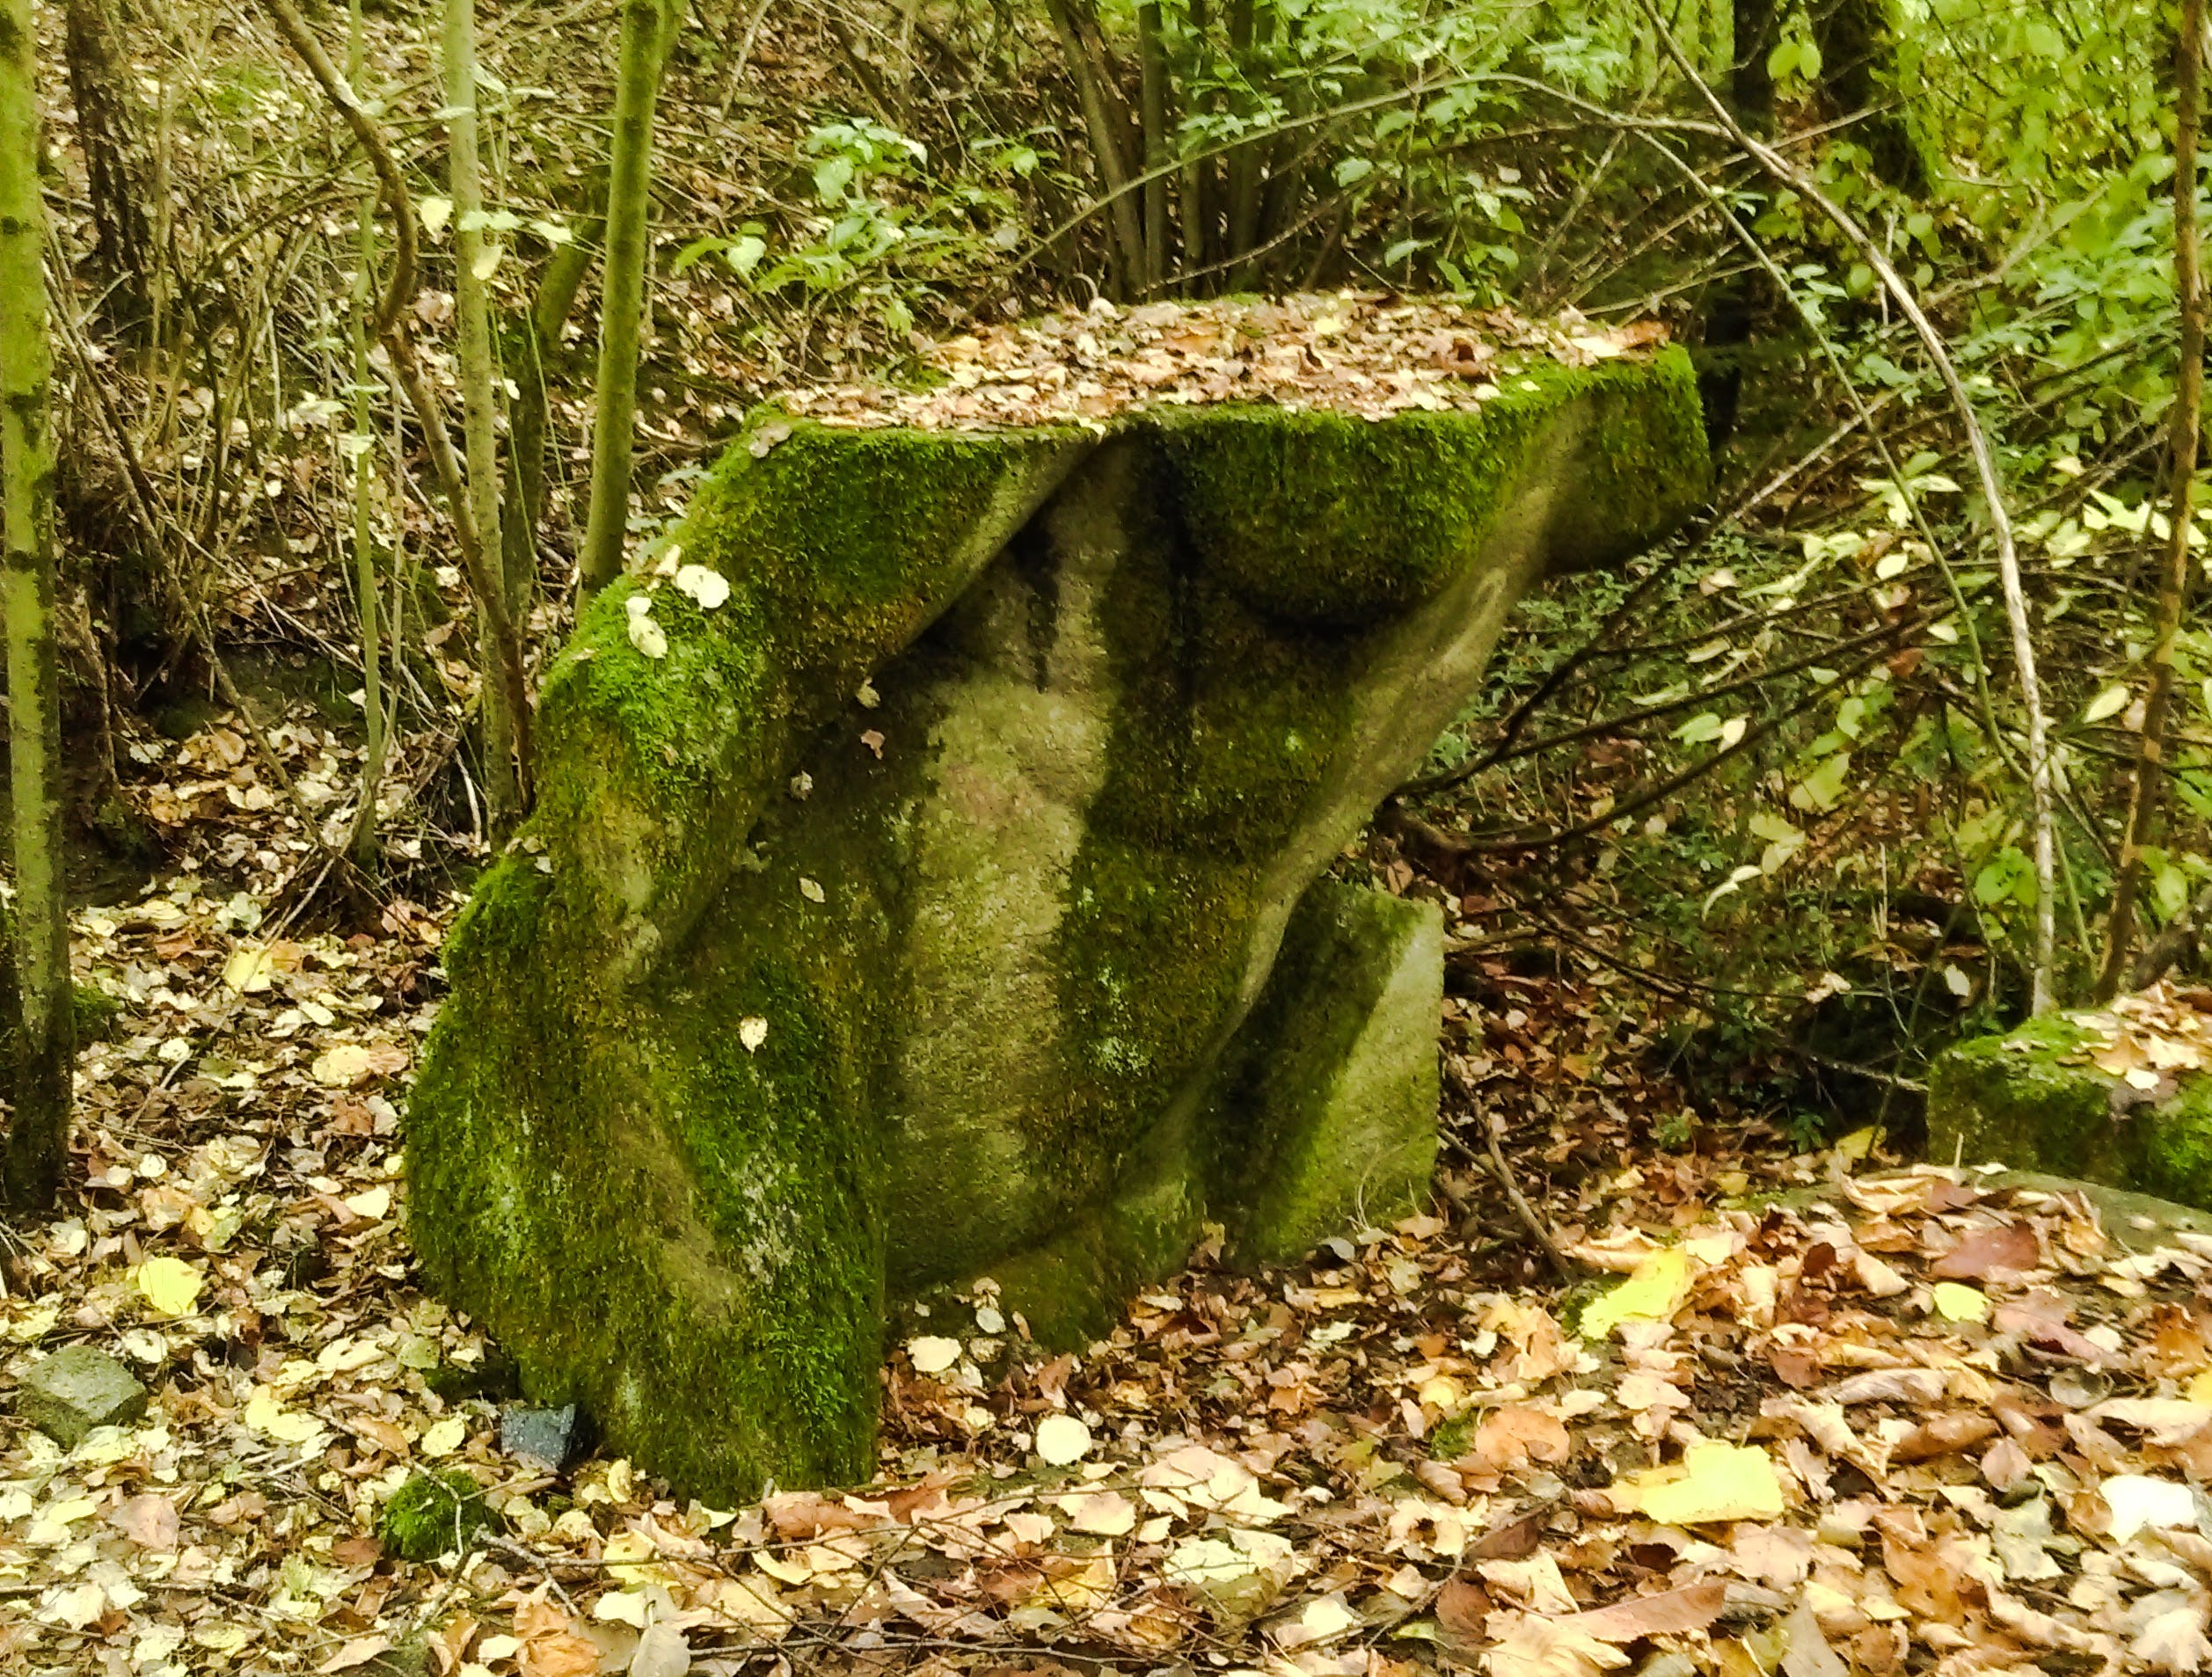 Kostenloses Stock Foto zu holz, skulptur, verlassen, verlassene skulptur